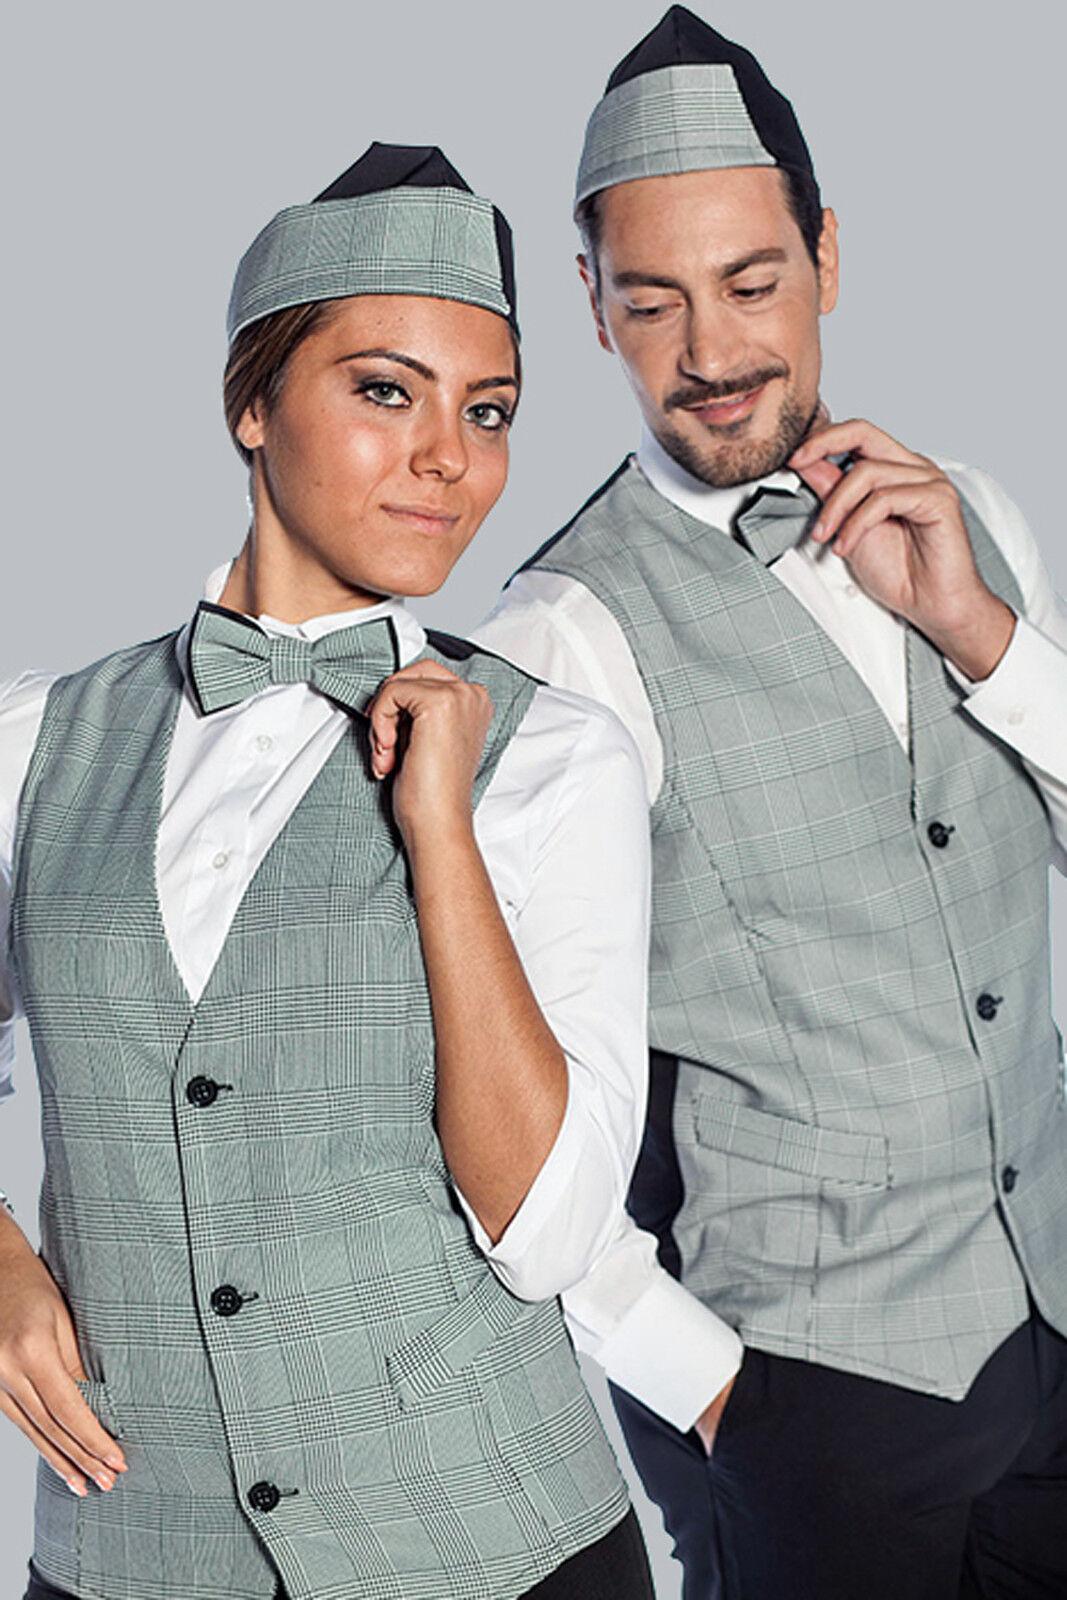 Waistcoat Vest Man Frau Work Business Elegant Bar Waiter Restaurant